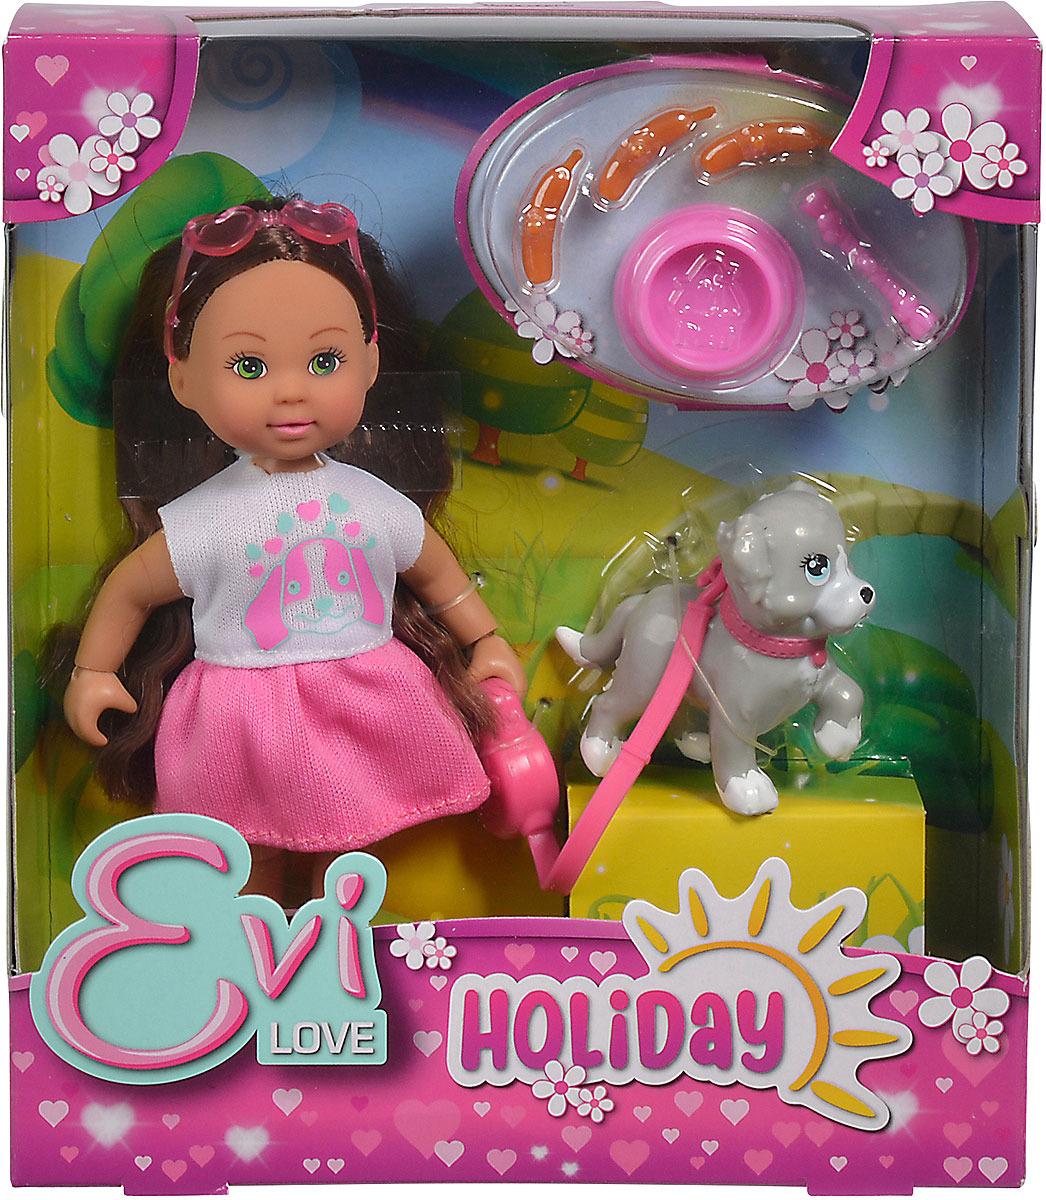 Мини-кукла Simba Holiday. Еви кукла еви со стильной собачкой